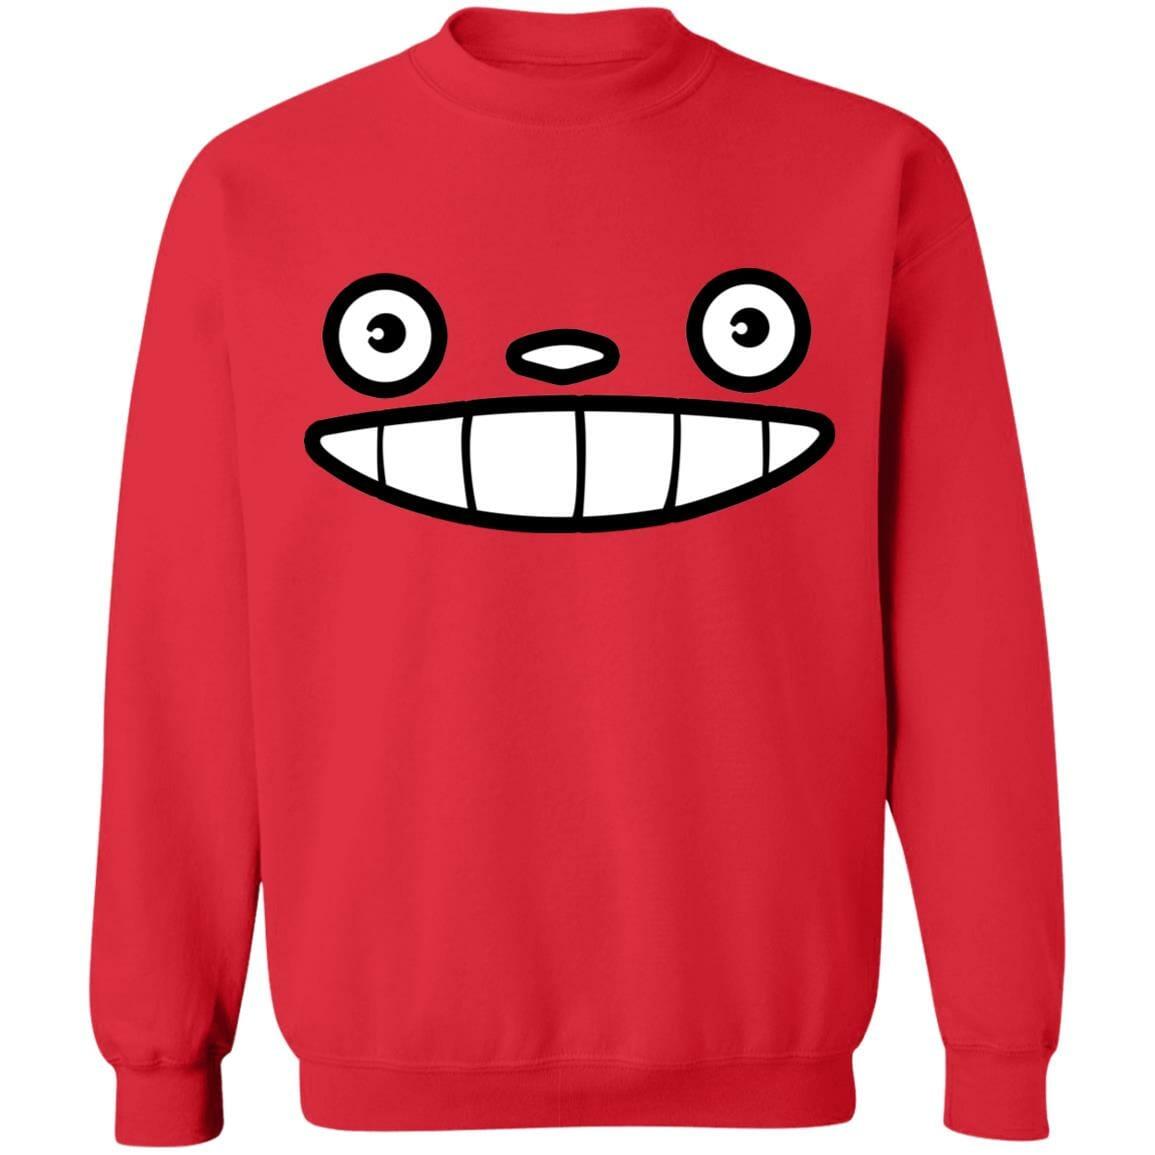 My Neighbor Totoro Face Sweatshirt